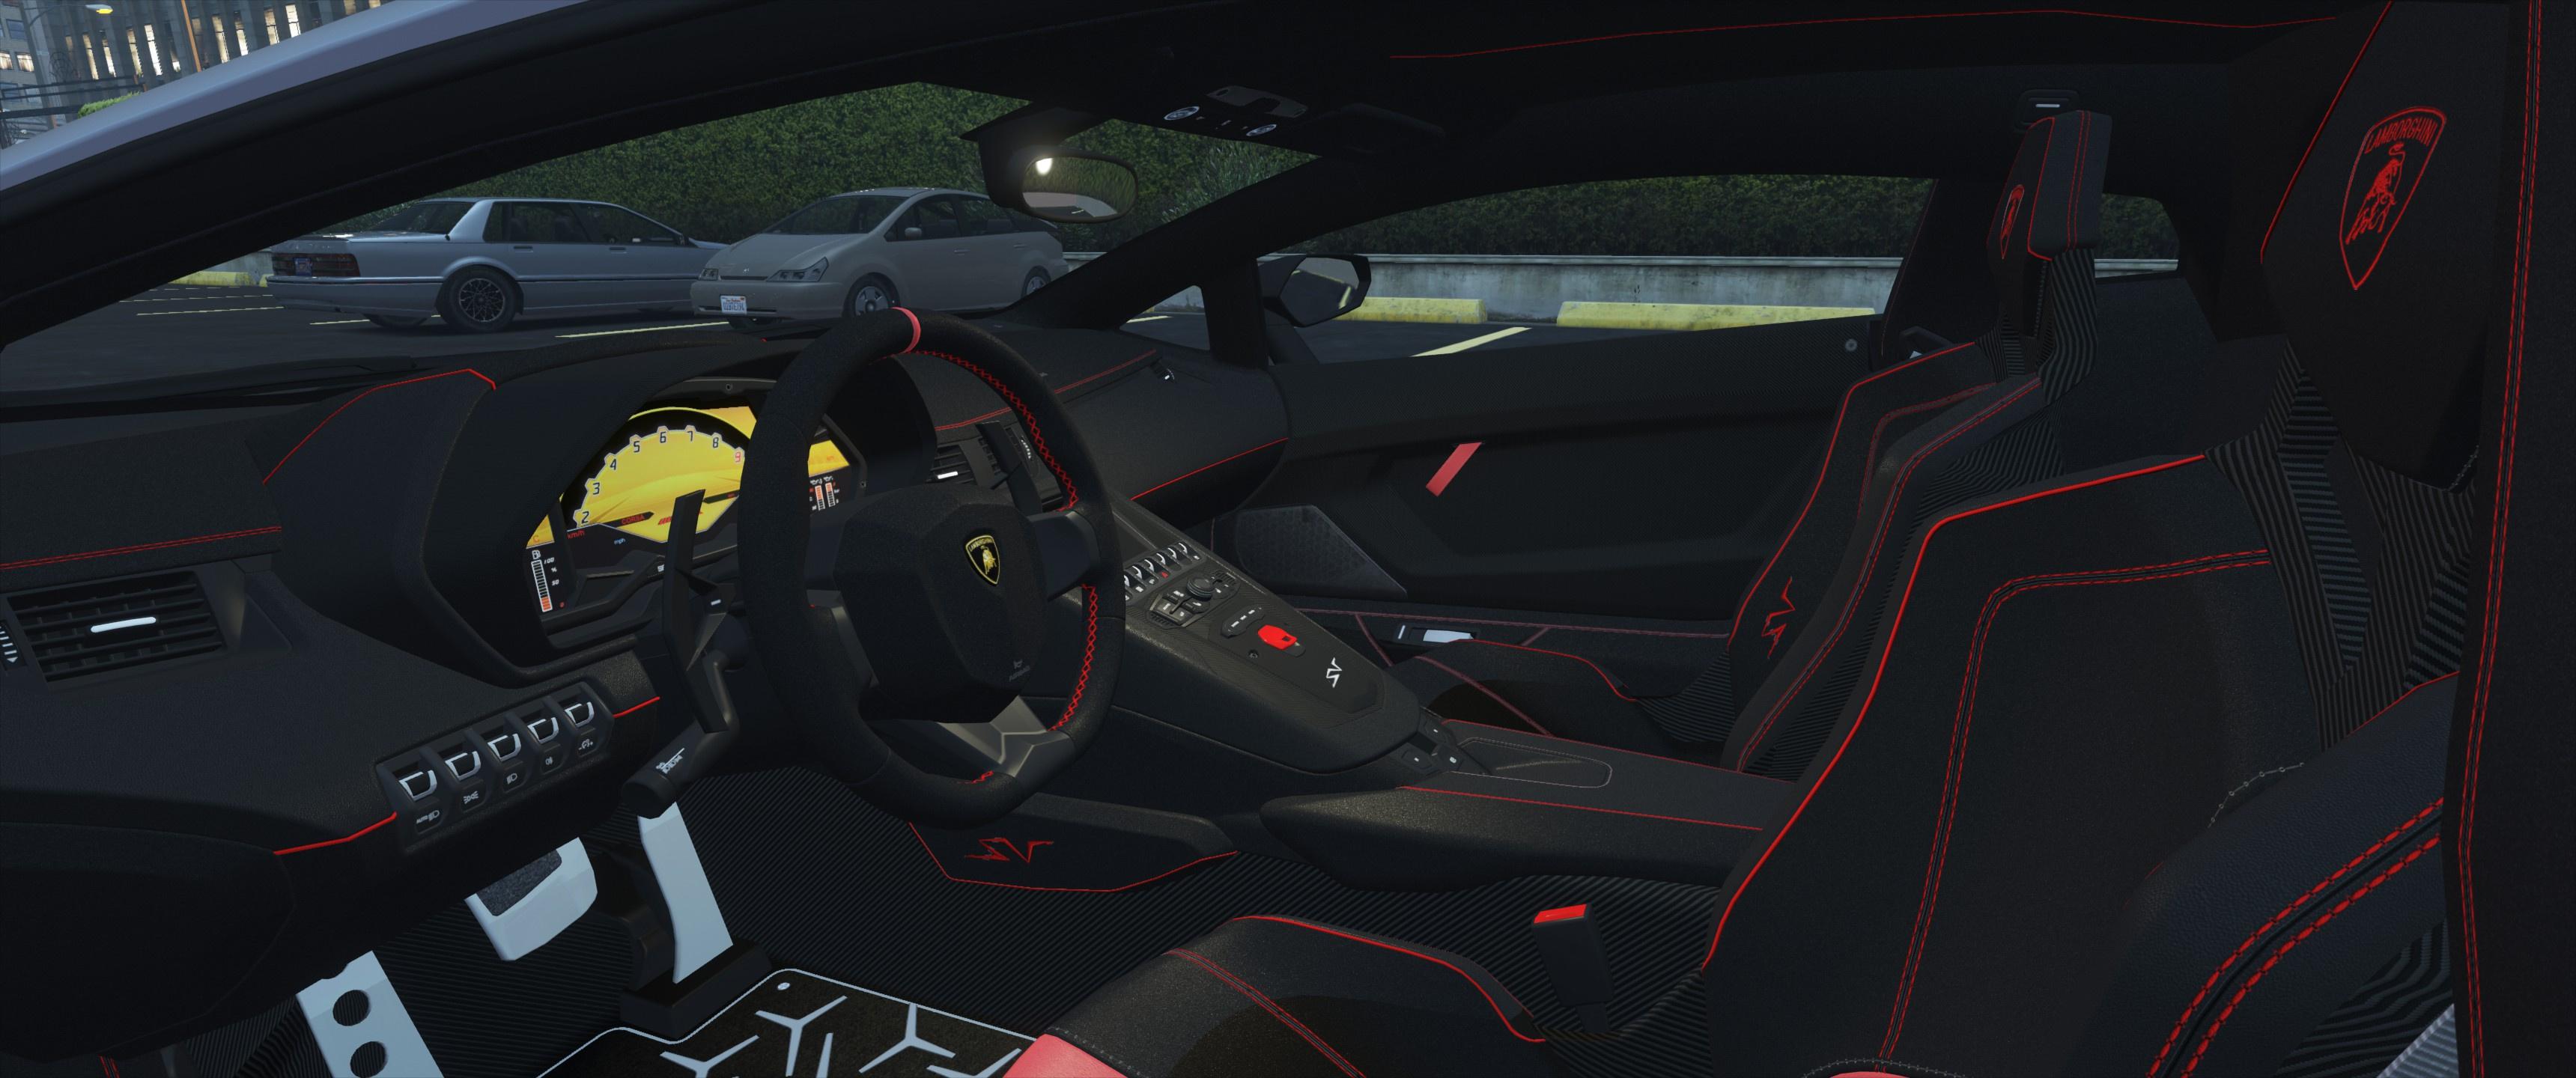 Lamborghini Aventador LP 750-4 SV '15 [Add-On] - GTA5-Mods com